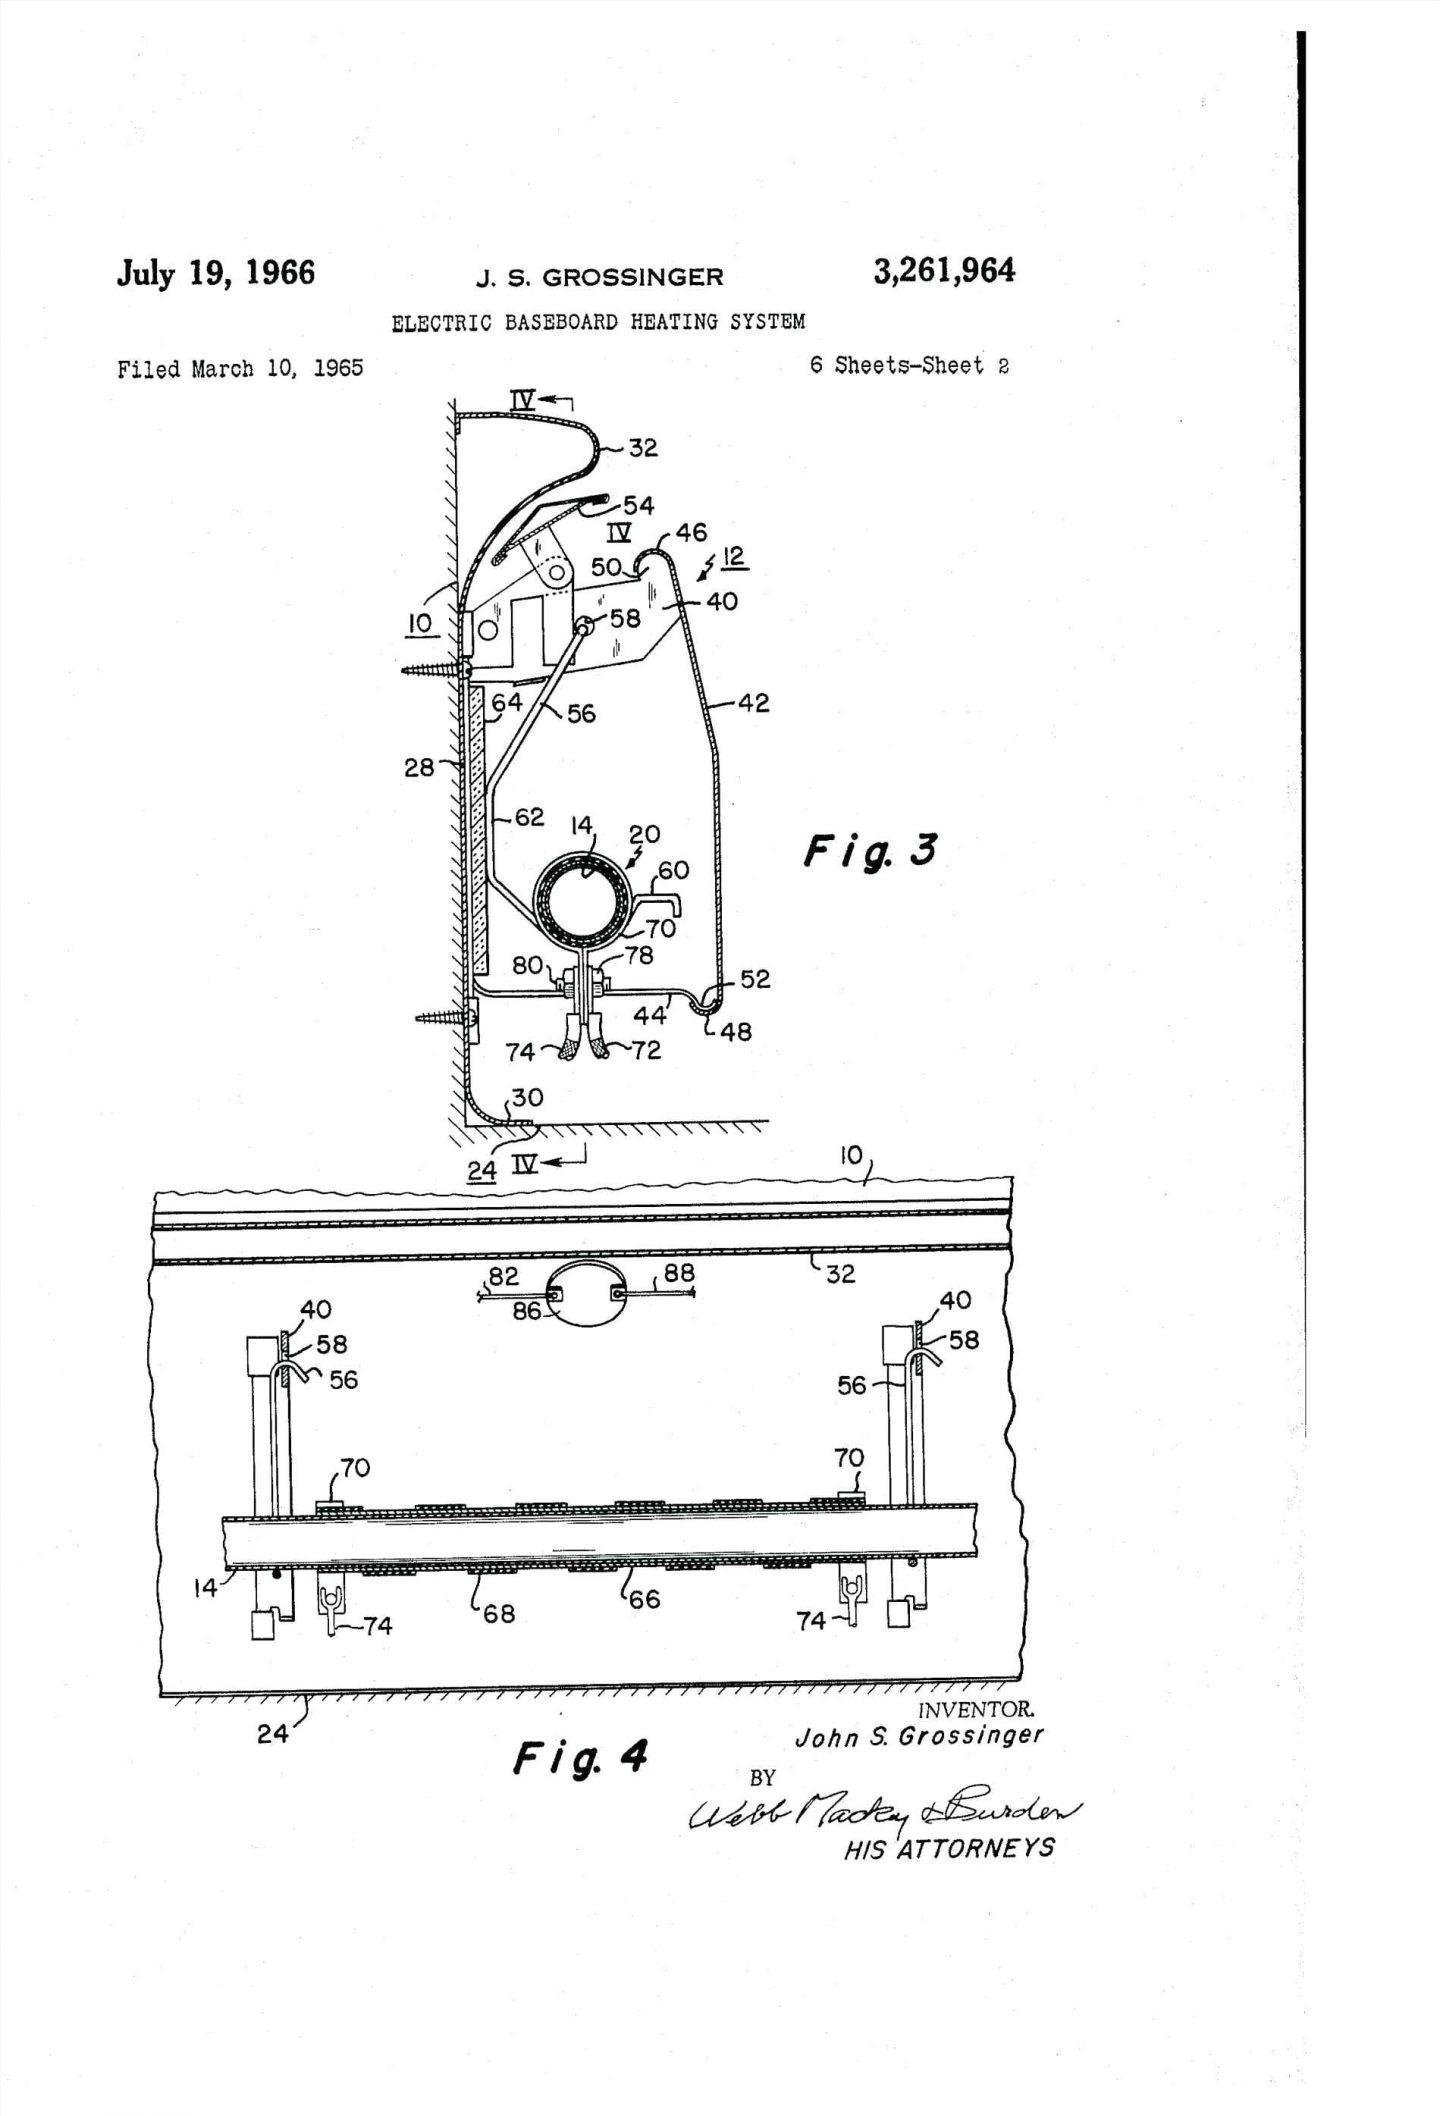 hight resolution of fostoria heater wiring diagram wiring diagram for qmark heater save wiring diagram likewise rh eugrab